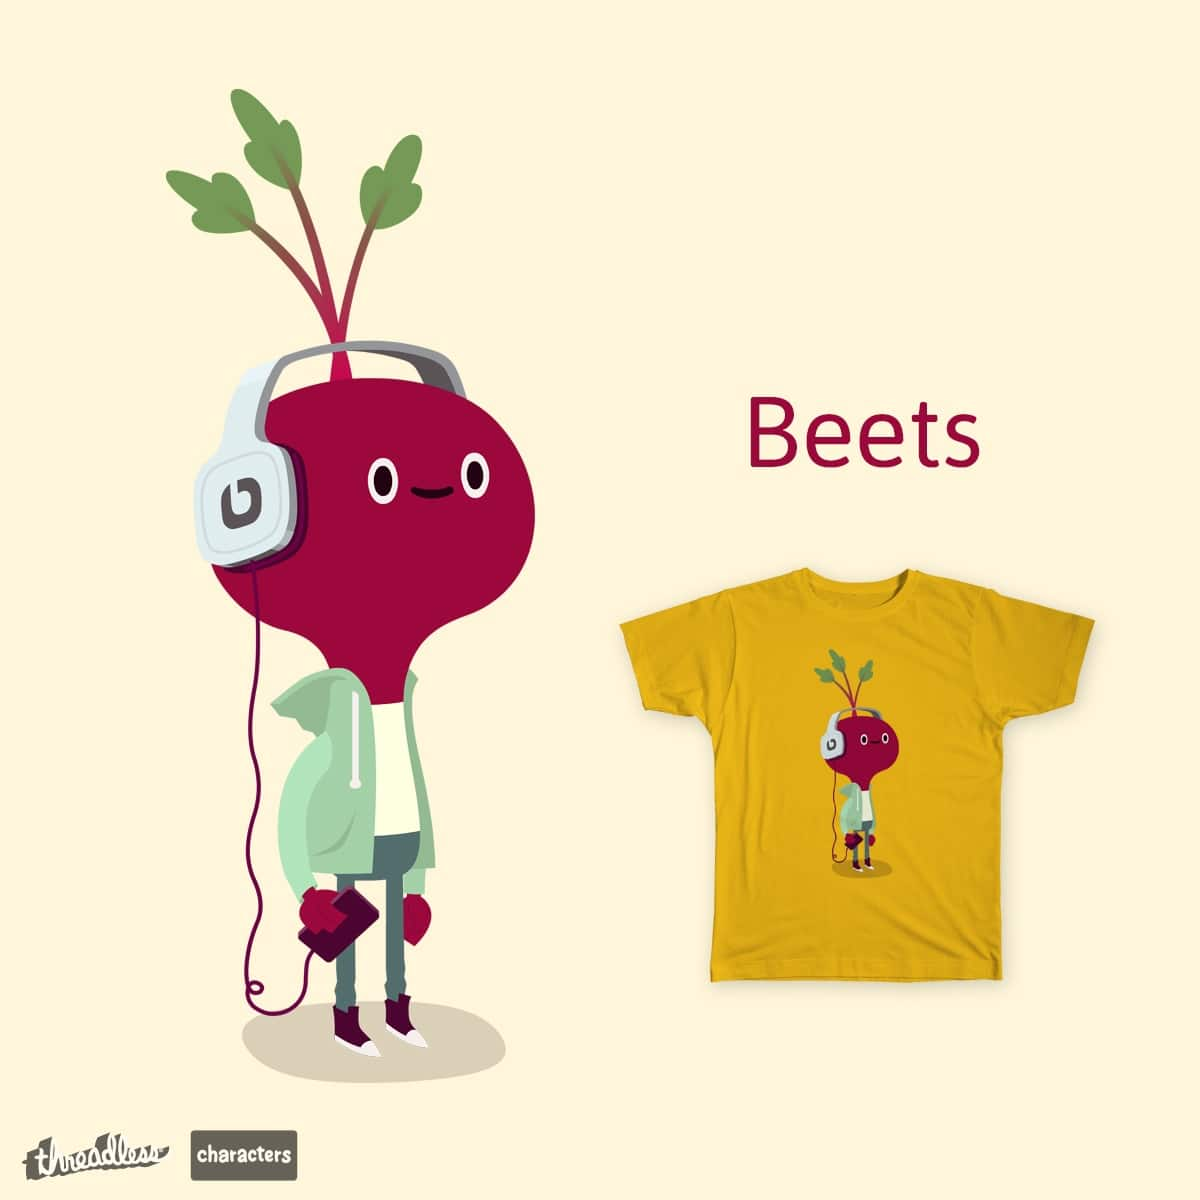 Beets by ALEJANDR0ID on Threadless